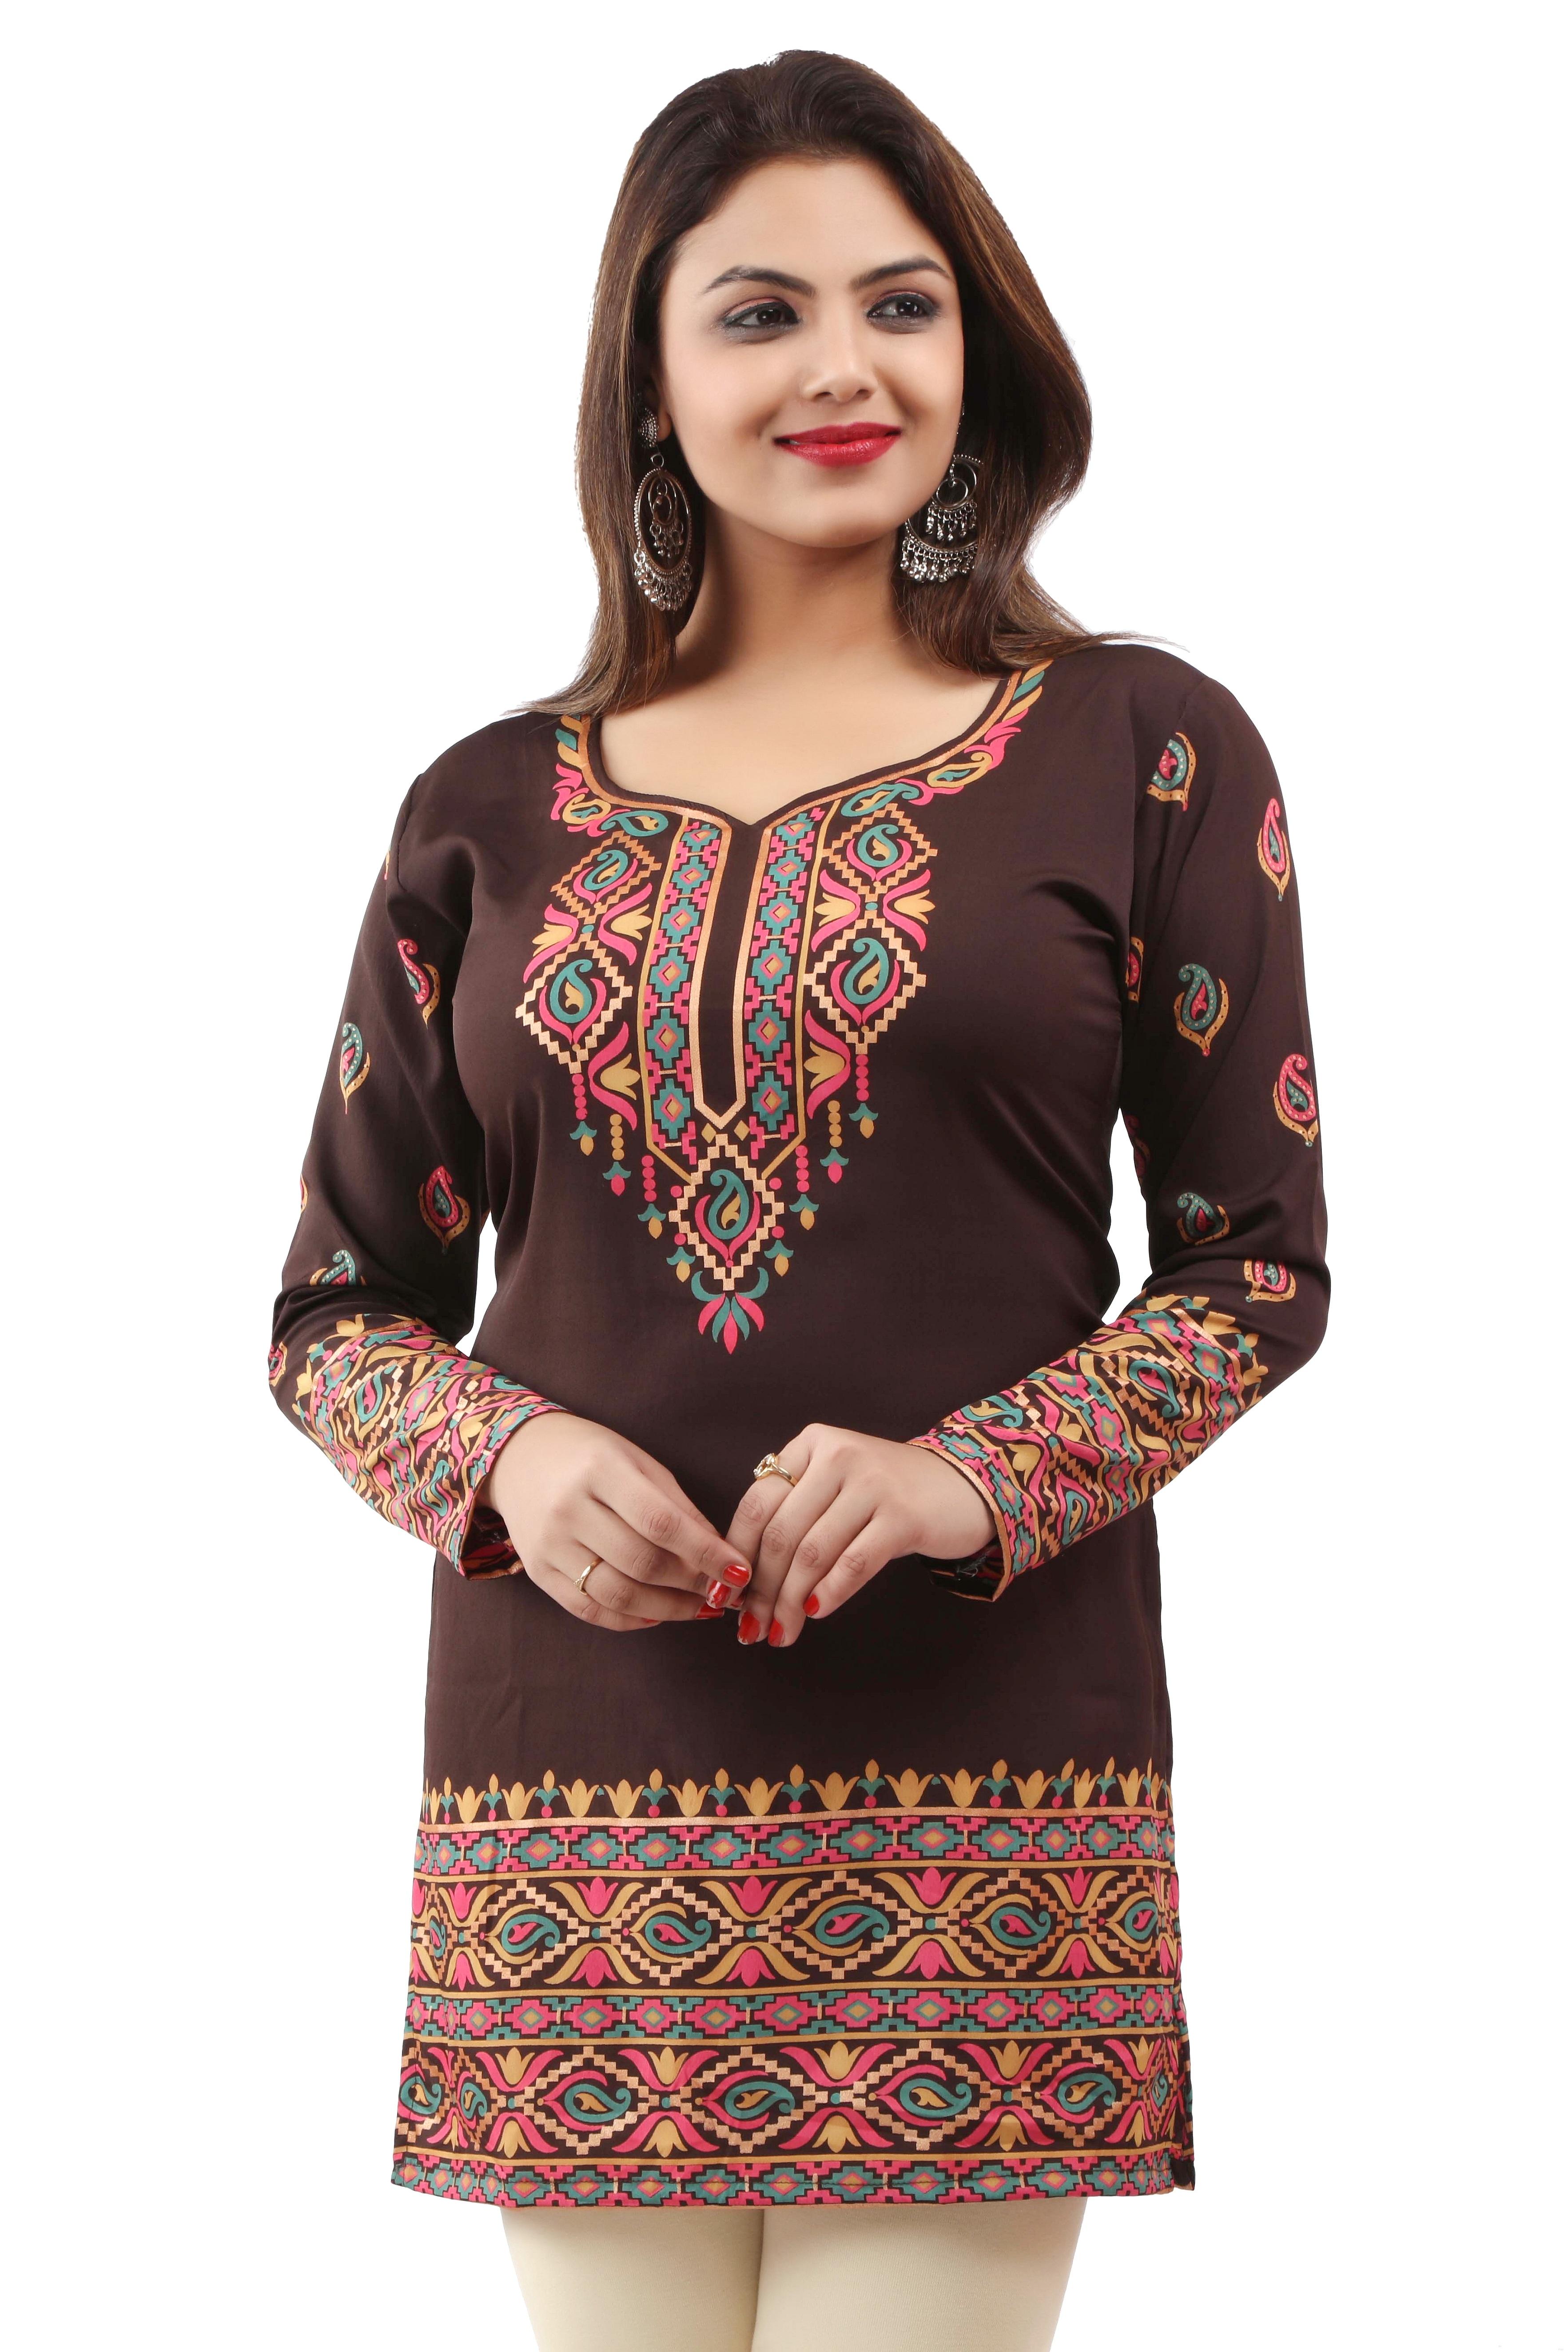 Embroidery Patch Brown Indian Short Kurti Tunic Kurta Top Shirt Dress ECCO02